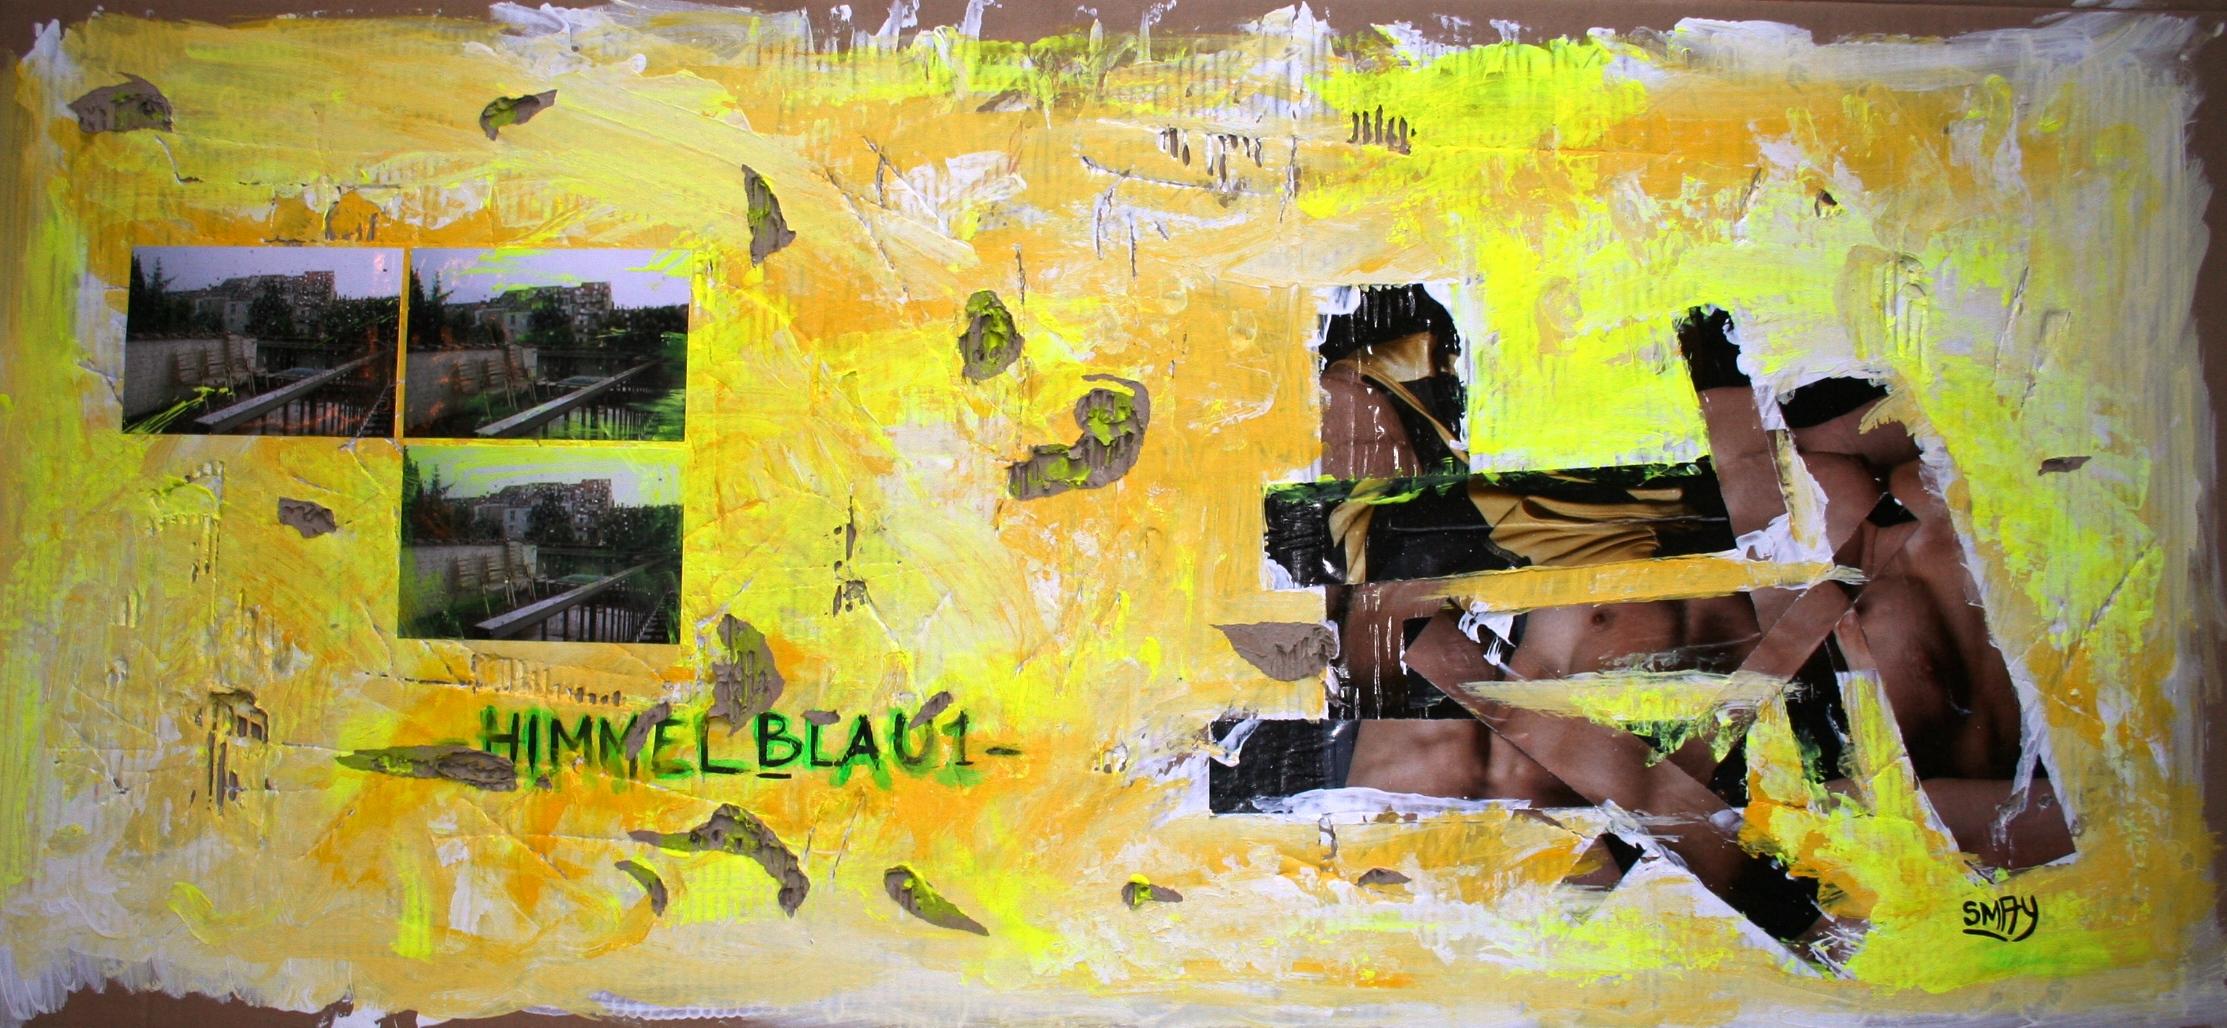 Himmelblau1  2009 Mixed media collage on cardboard 122 x 55cm